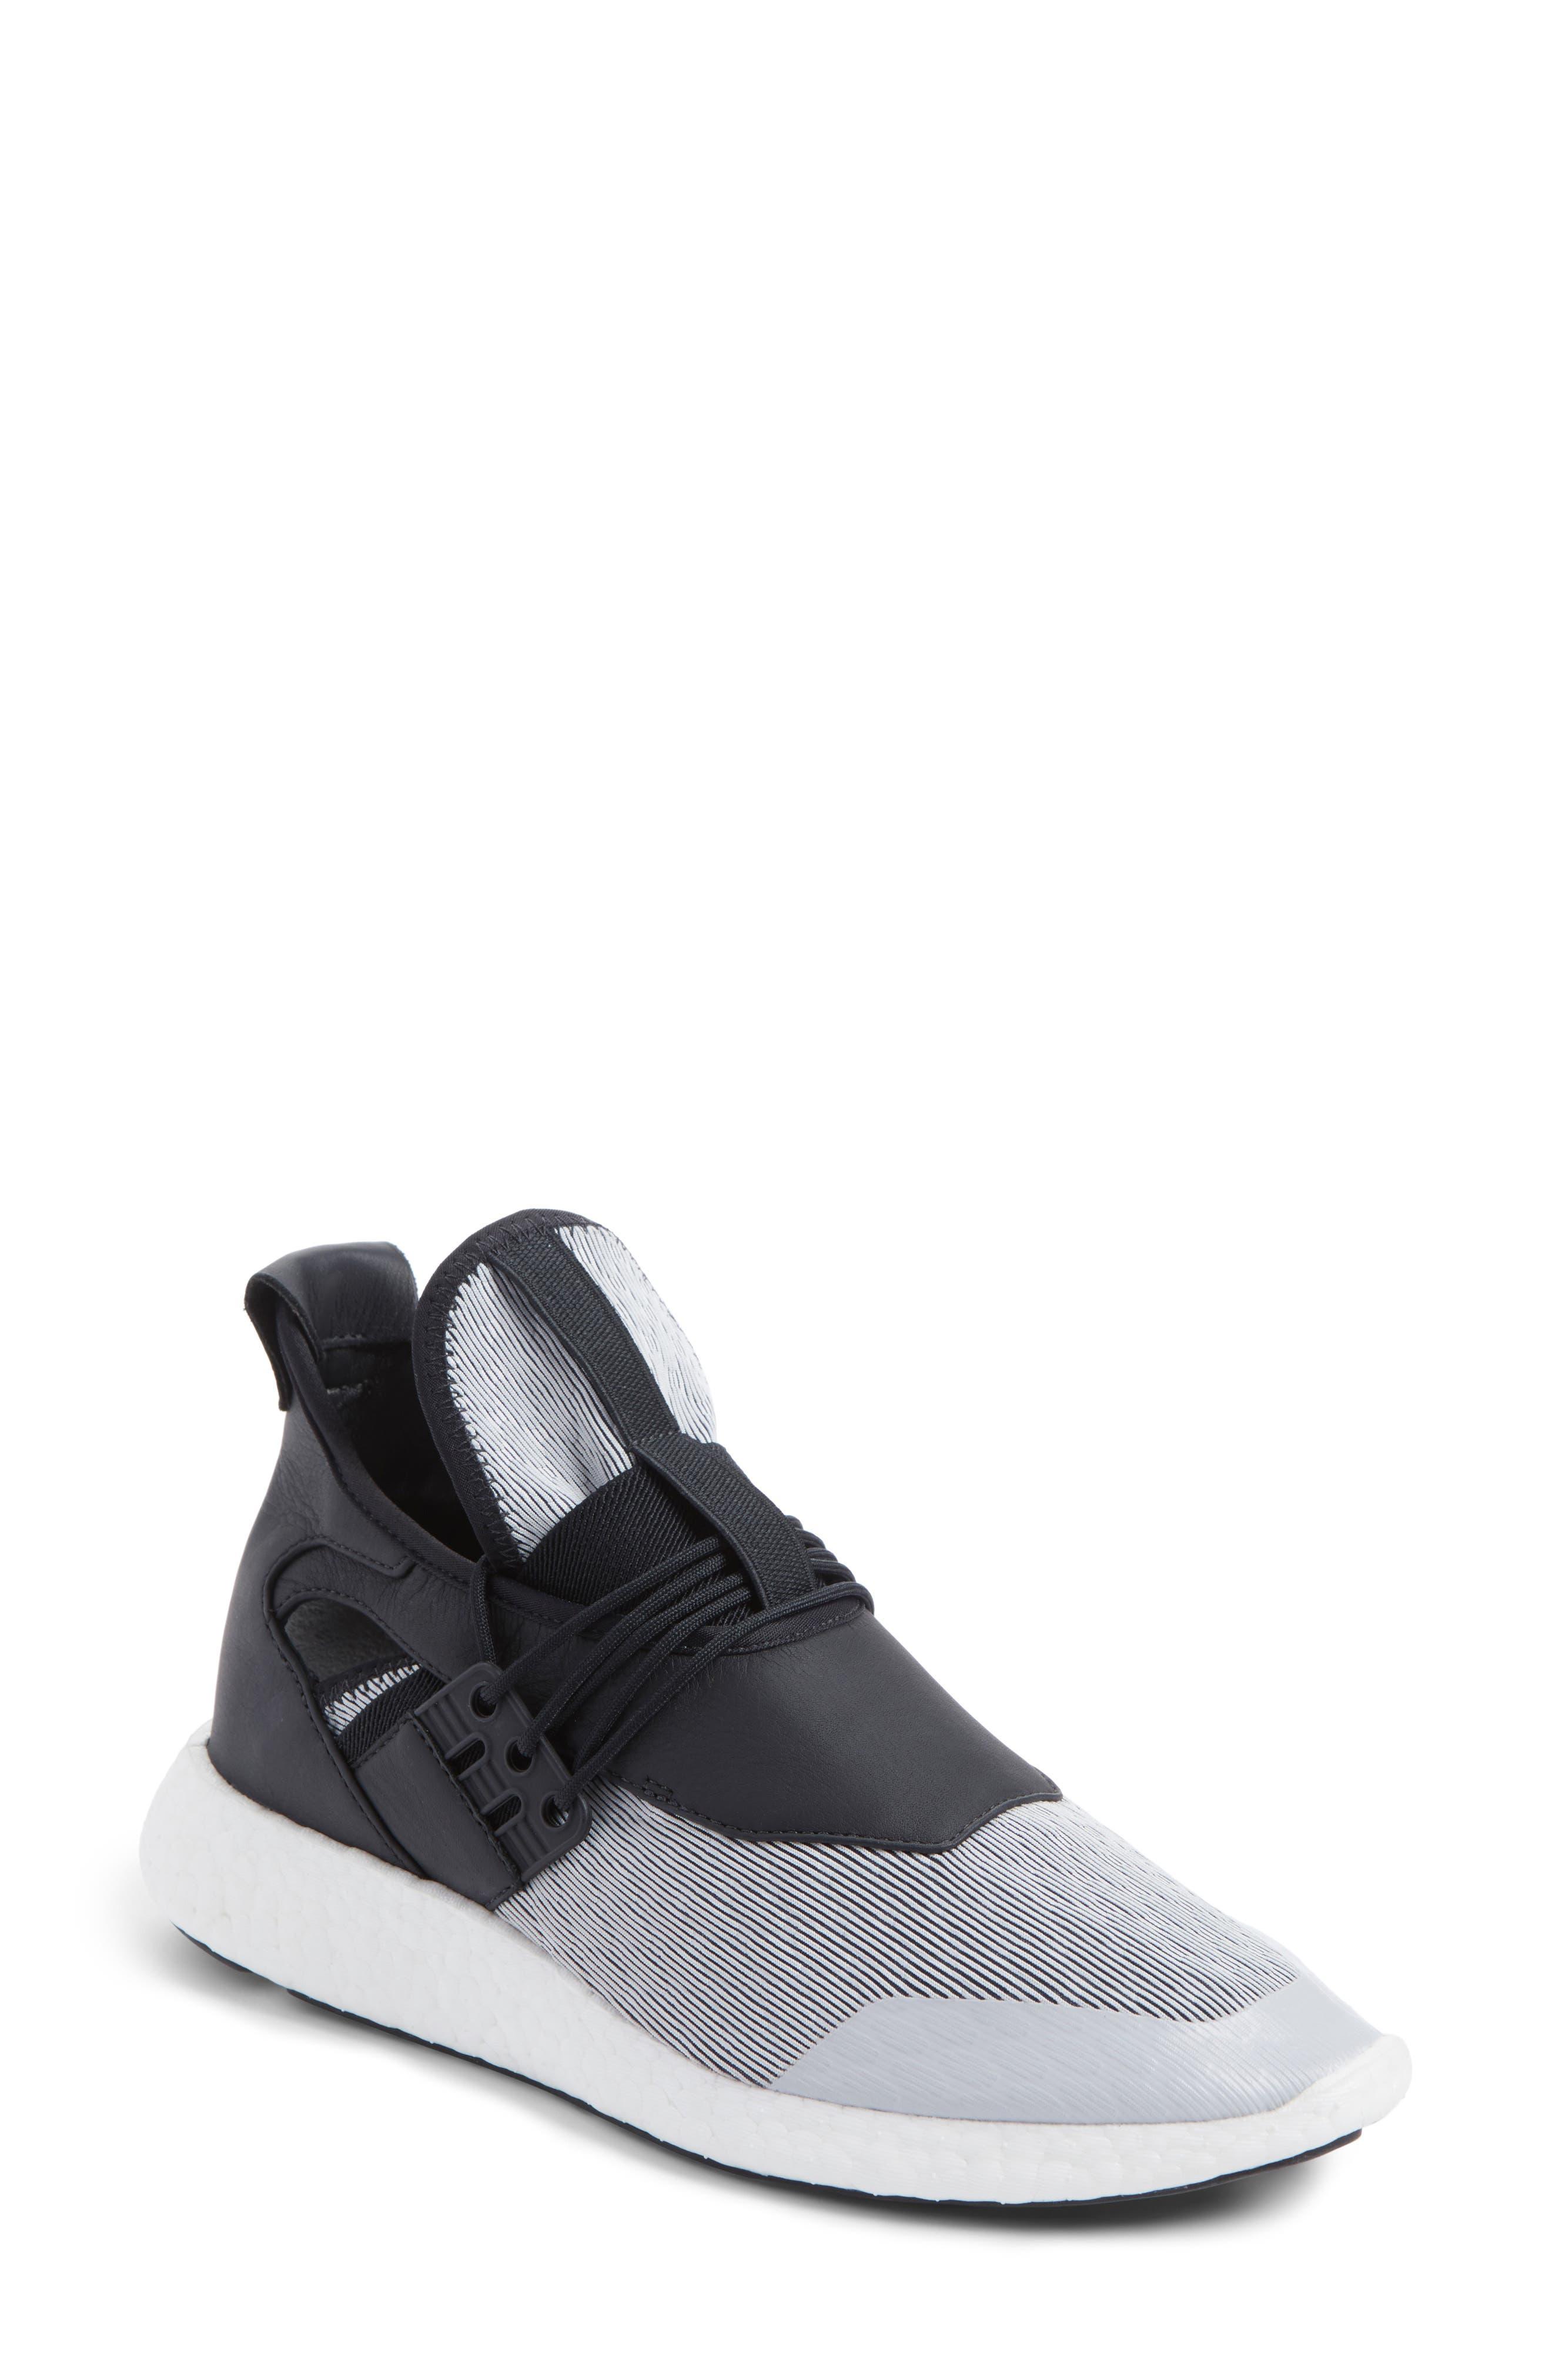 Elle Run Sneaker,                         Main,                         color, 021